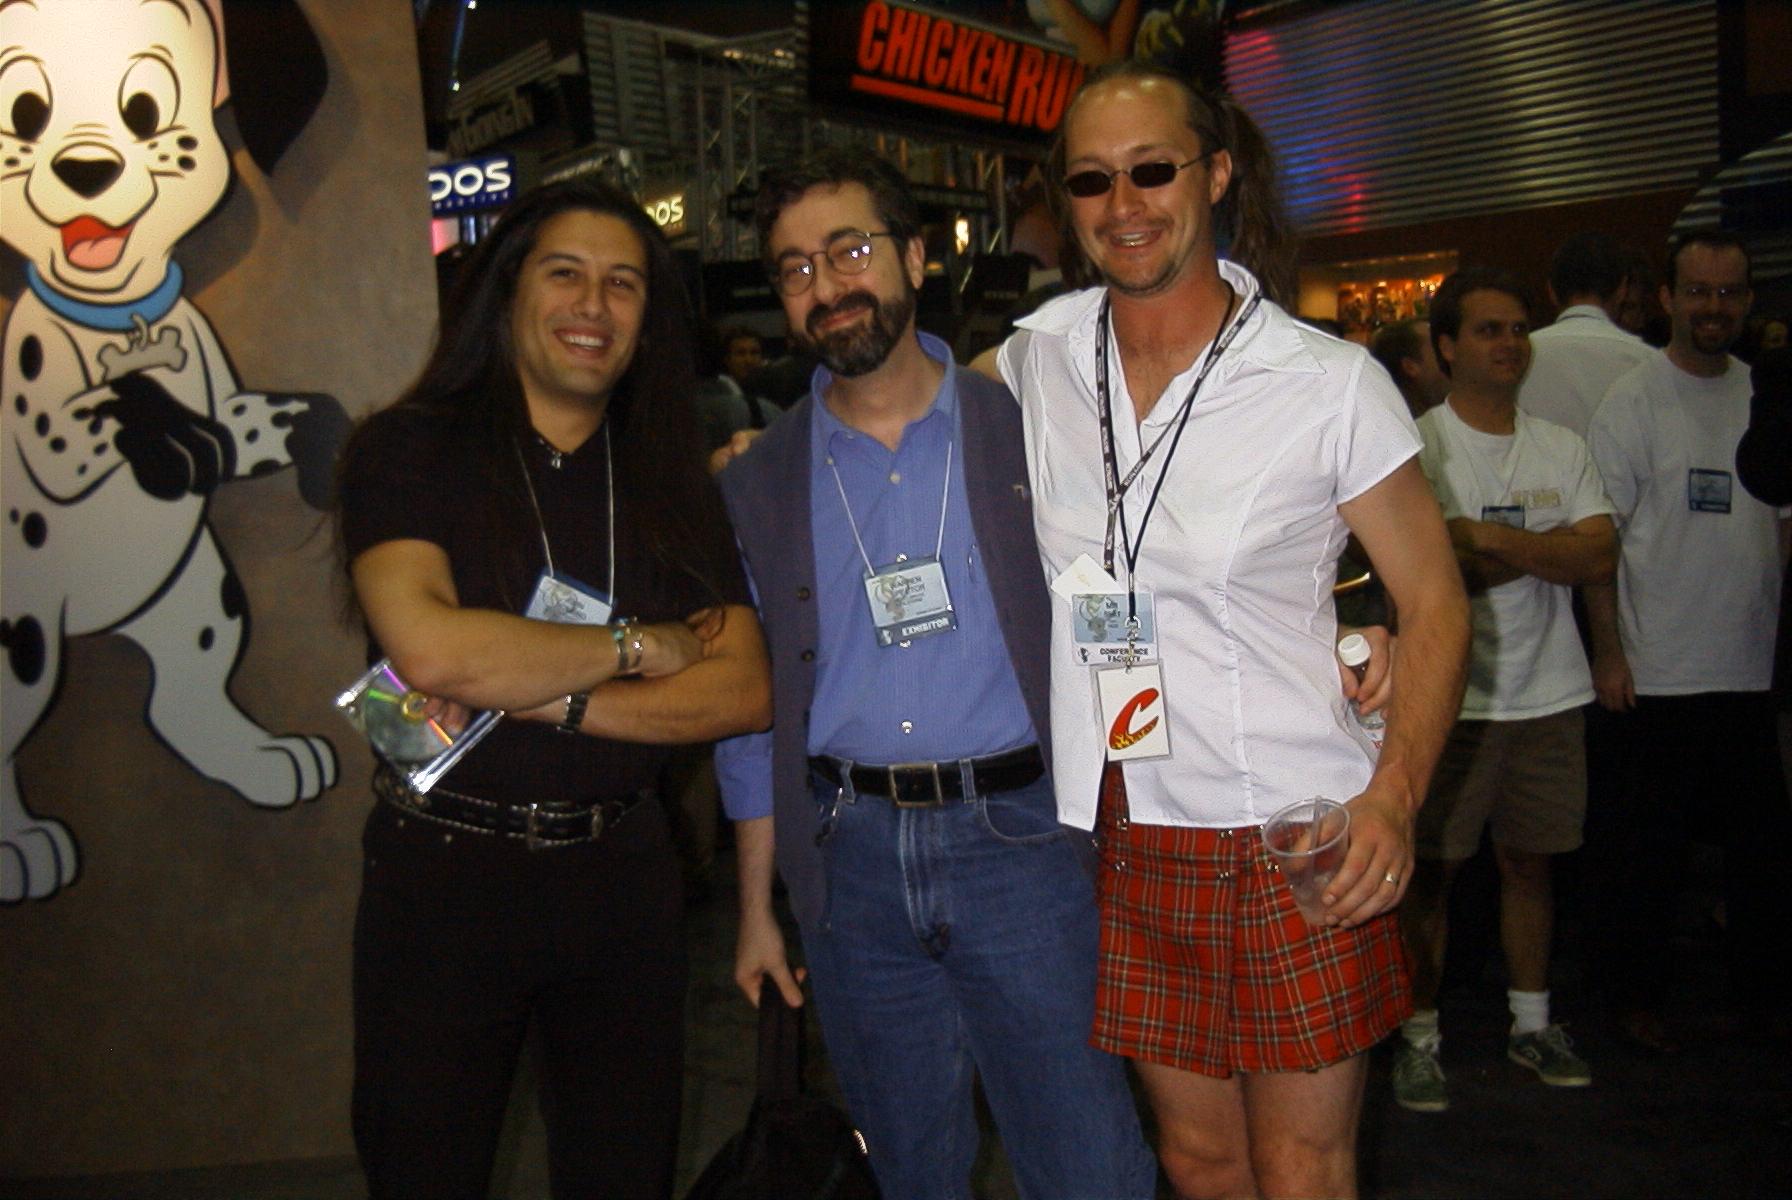 [TOPIC NOSTALGIQUE] L'E3 en image Romerosprectorwilson